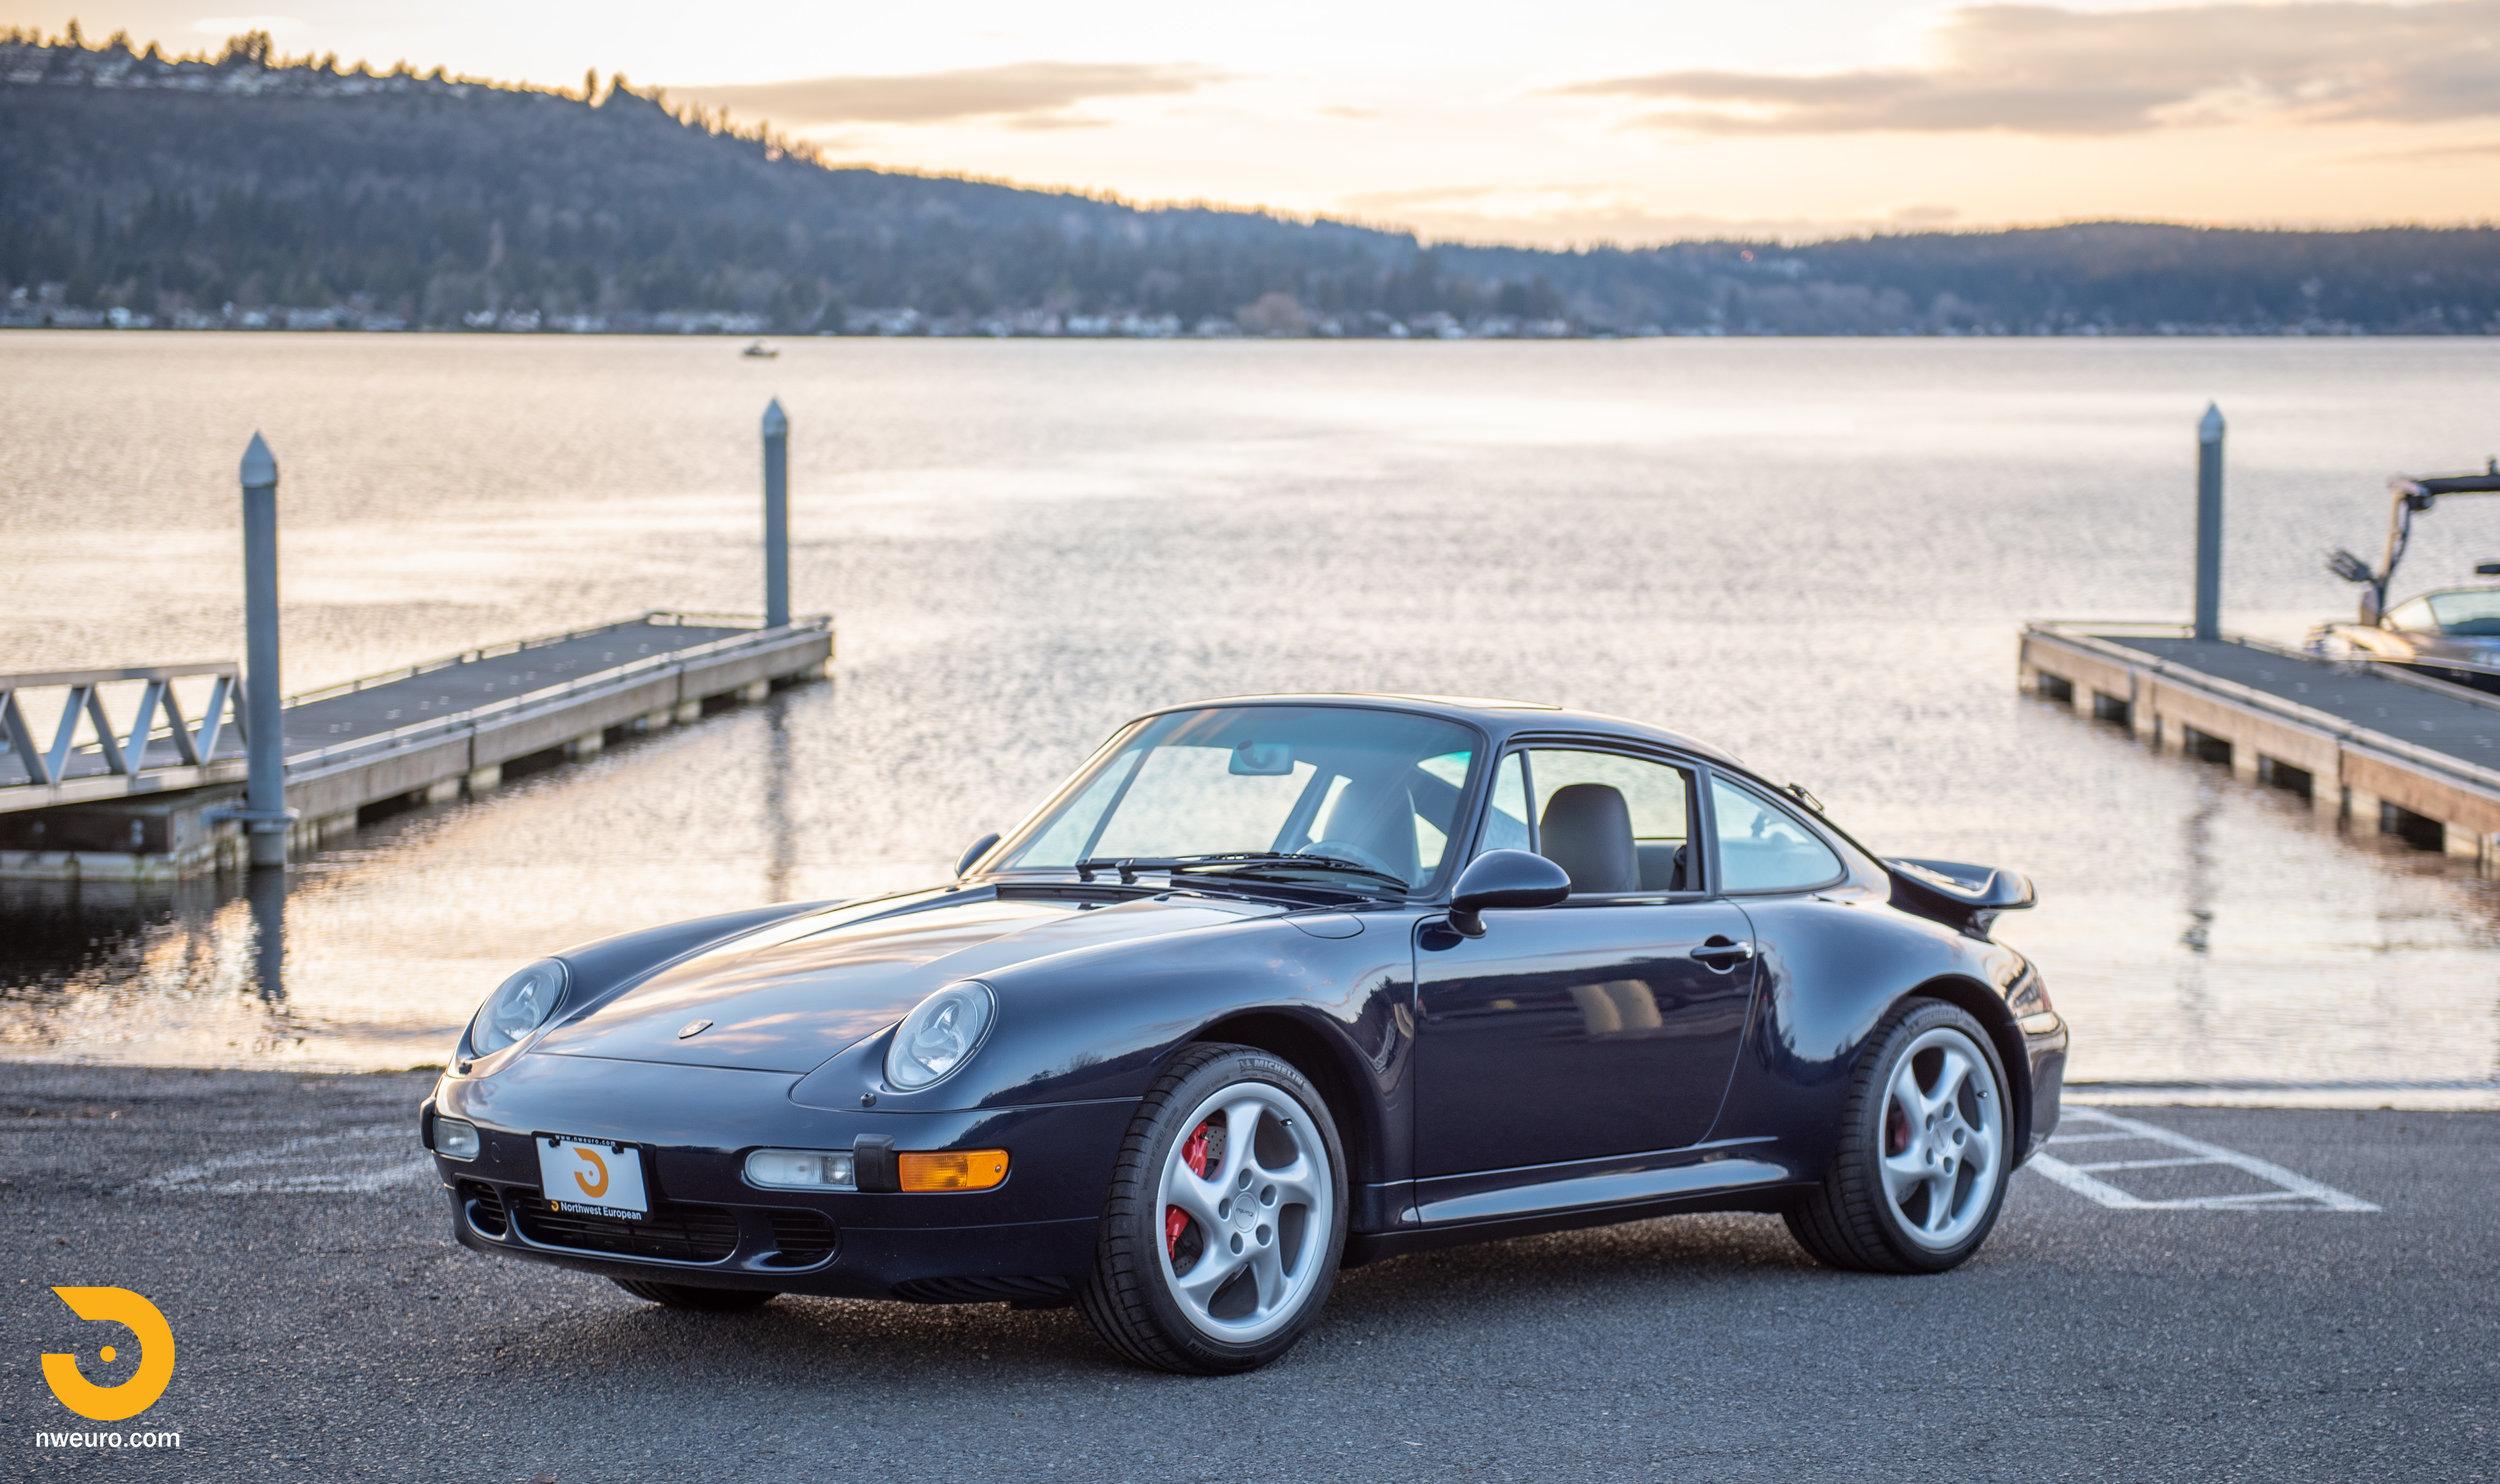 1997 Porsche 993 Turbo Ocean Blue-44.jpg